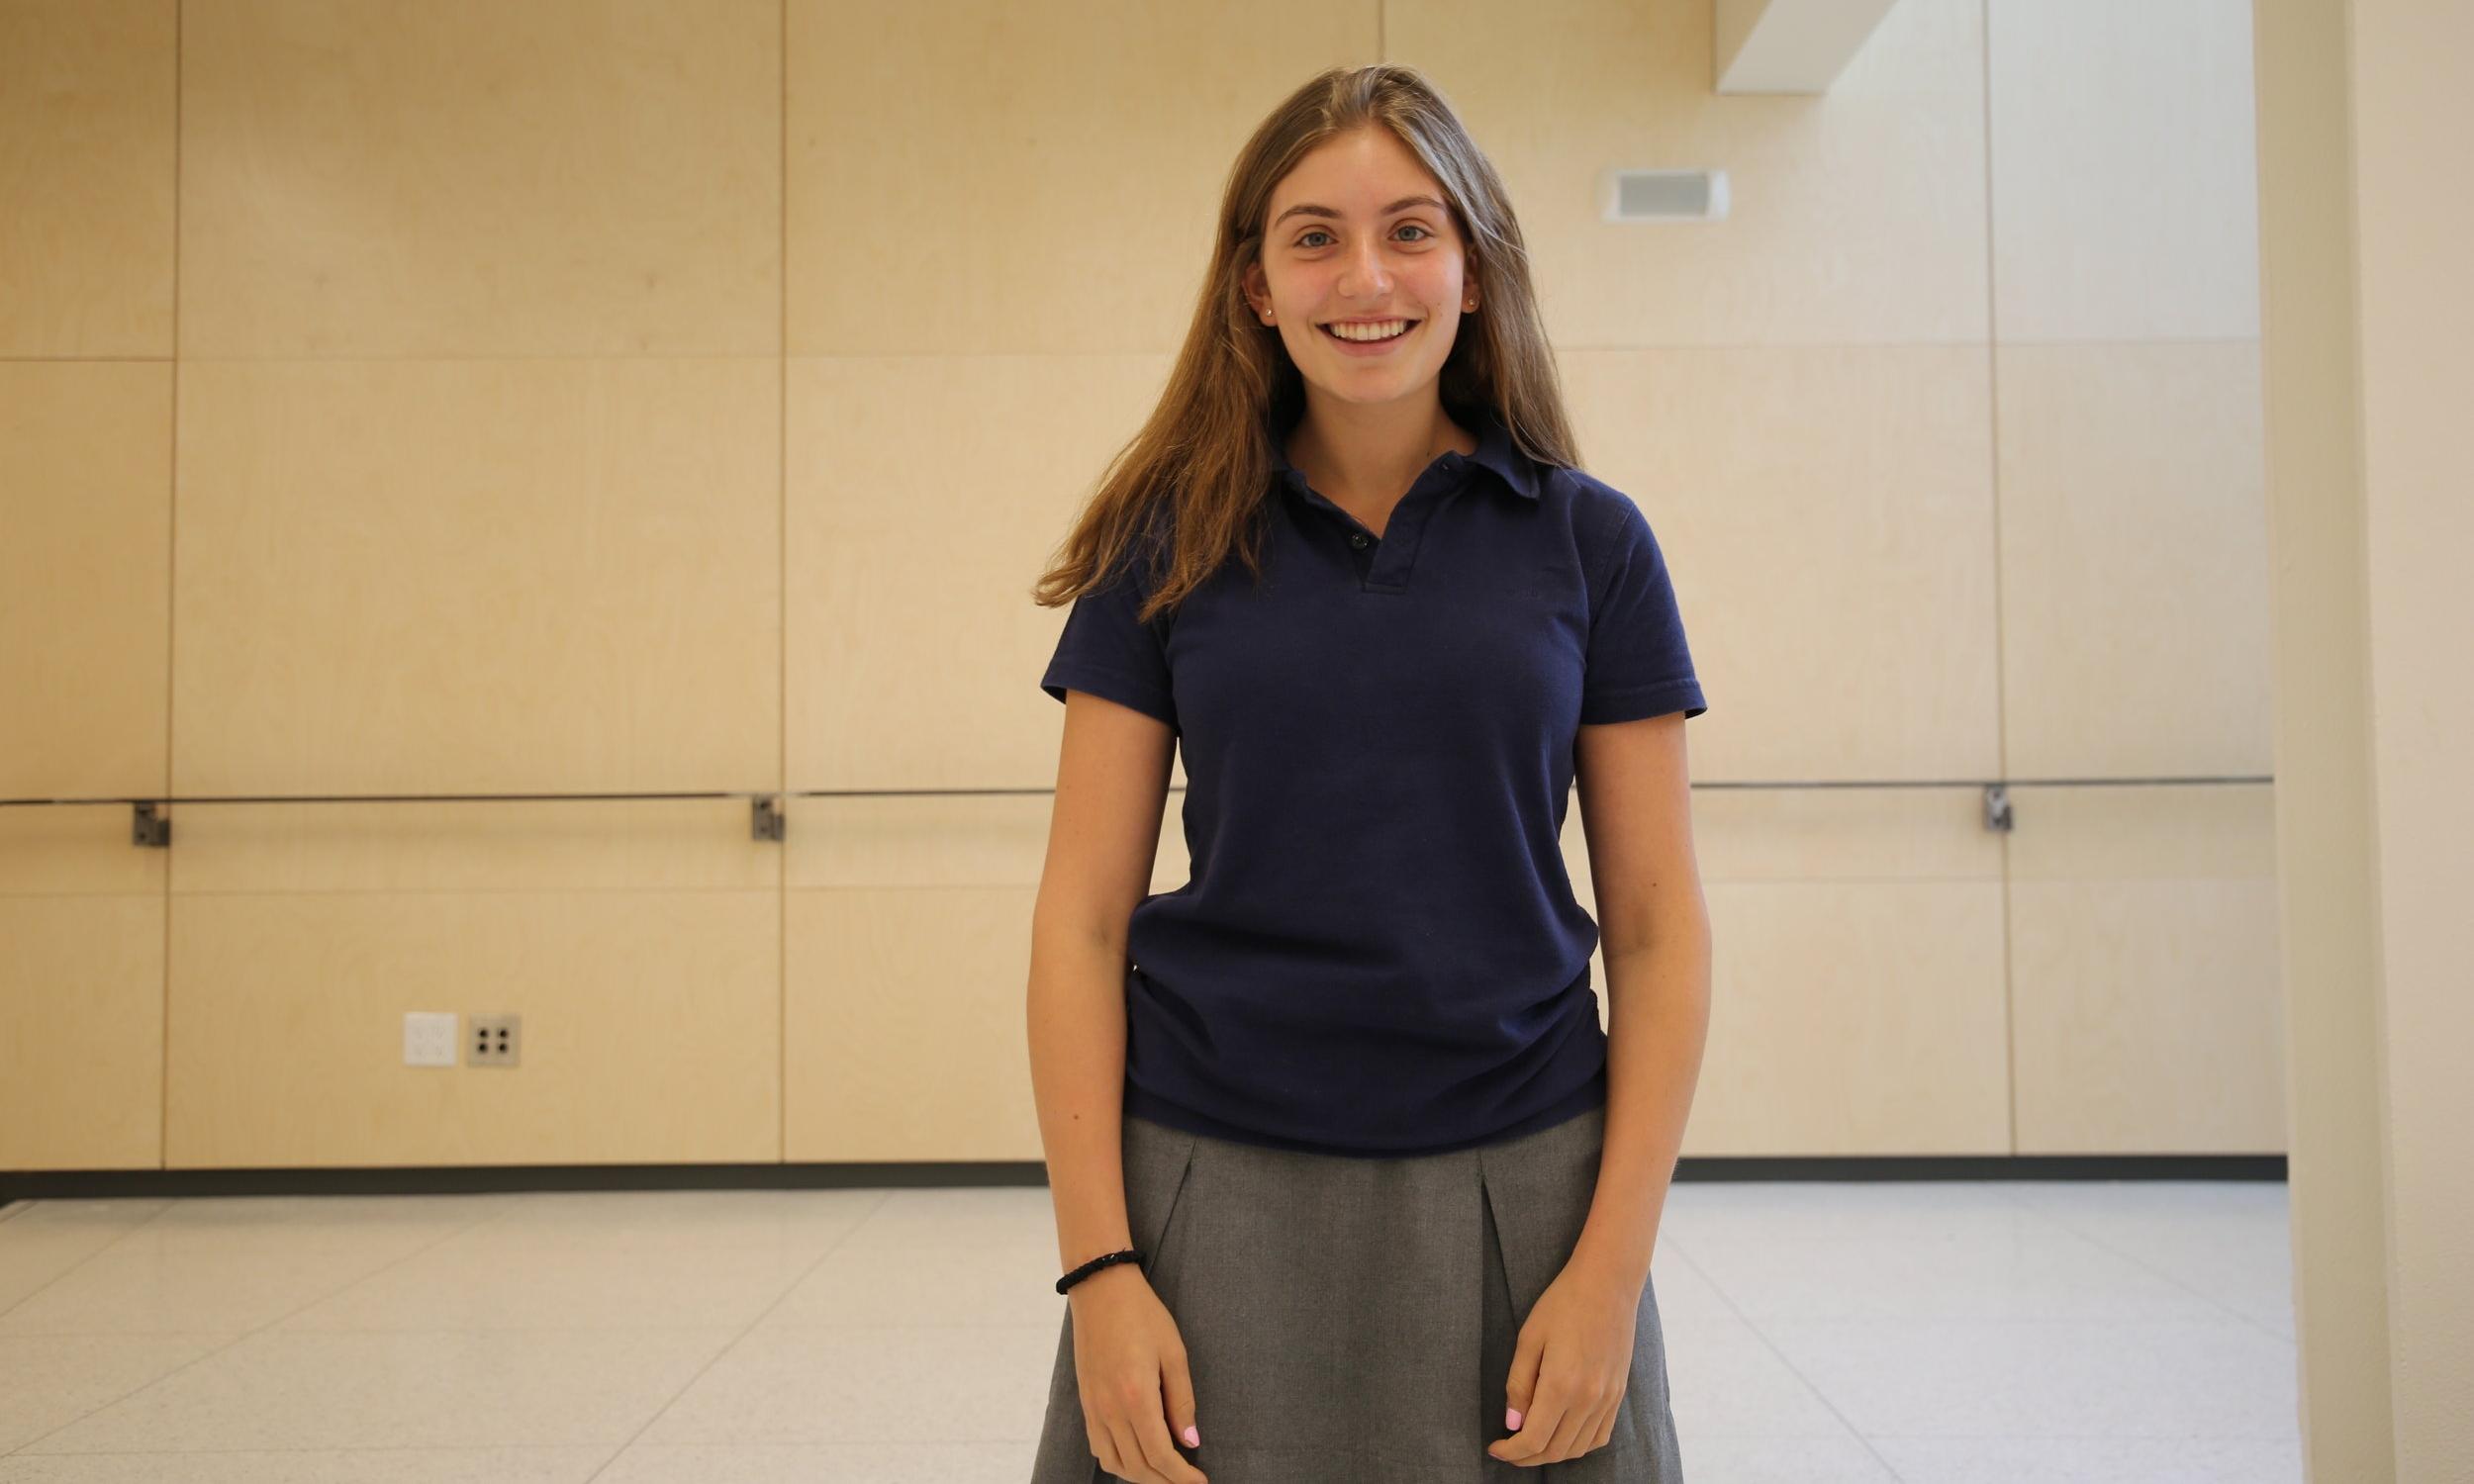 CAROLYN LEVITT, GRADE 12 - ON THE [NEW] YORK SCHOOL CAMPUS